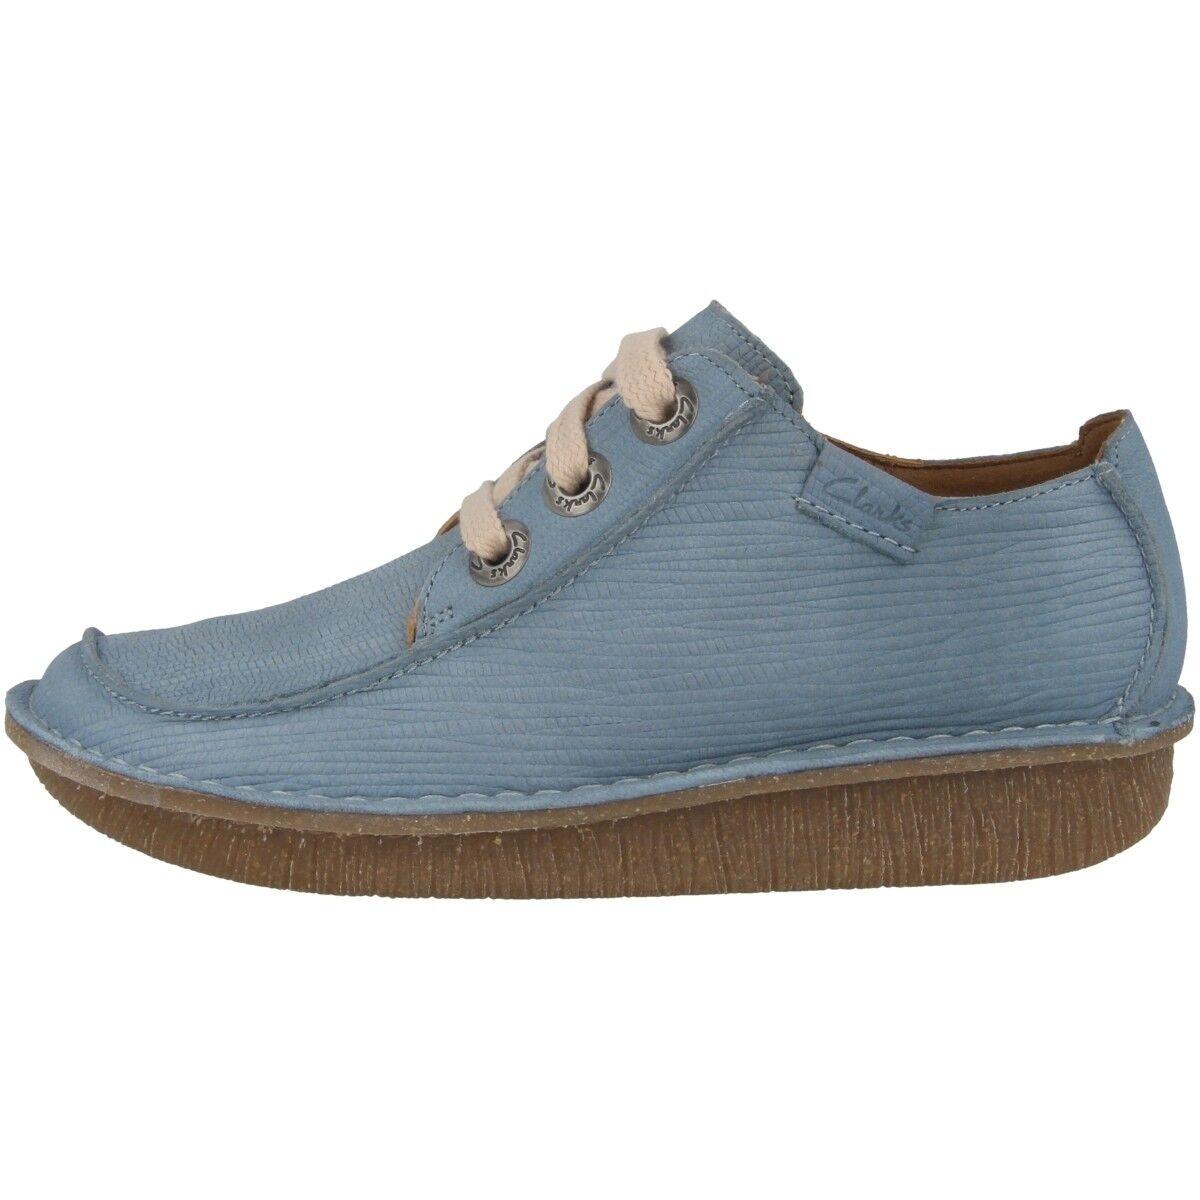 Clarks Funny Dream Chaussures Femmes Chaussures Basses Cuir Chaussure Lacée bleu gris 26132344